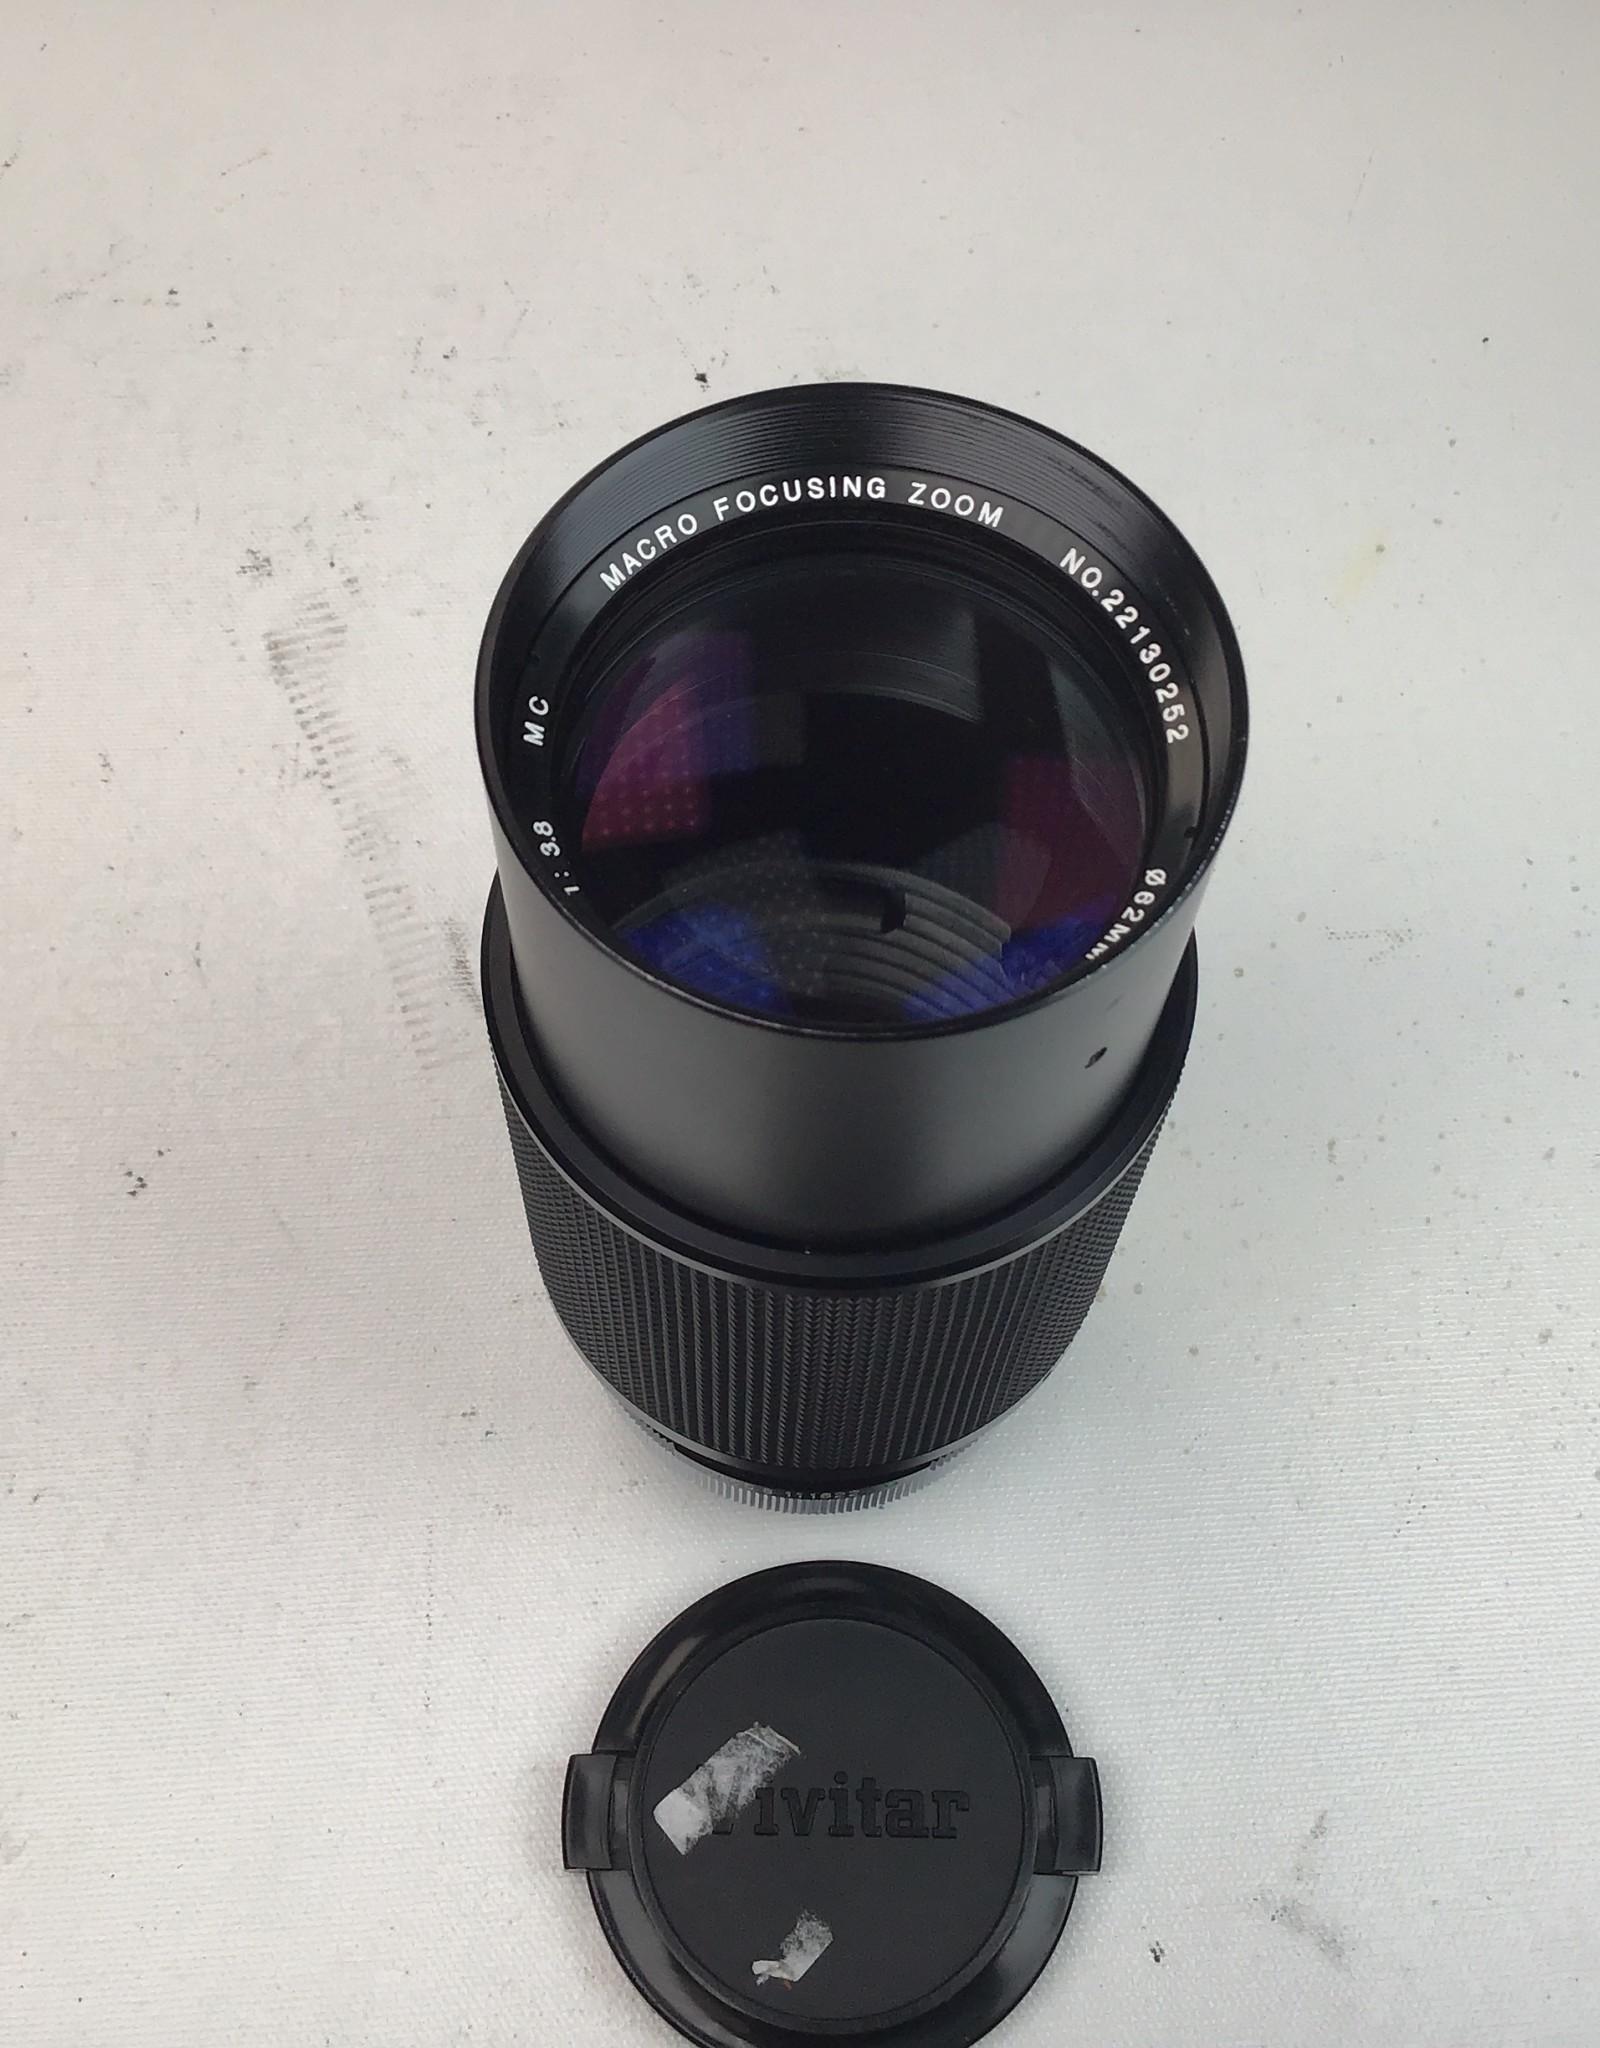 Vivitar Vivitar 75-205mm f3.8 Macro Focusing Lens for Canon FD Used Good.